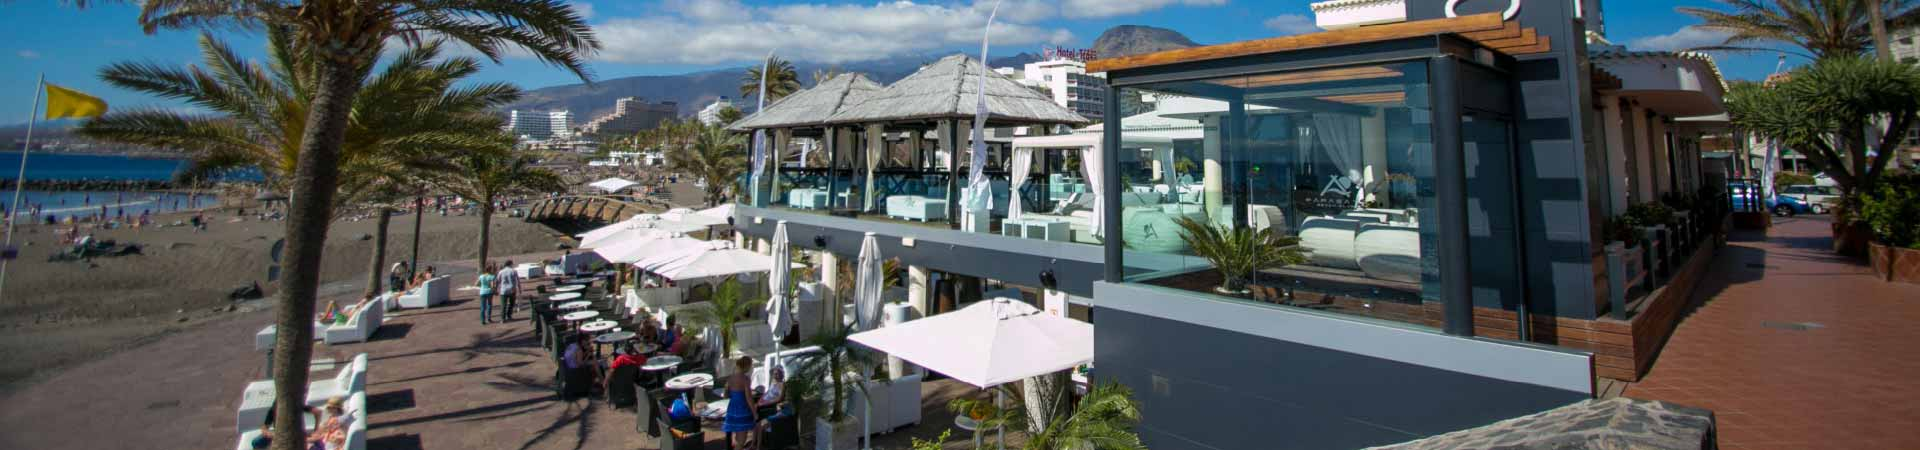 https://www.goodmorningtenerife.com/wp-content/uploads/2015/07/01_slide_papagayo-beach-club-1920x450-1.jpg